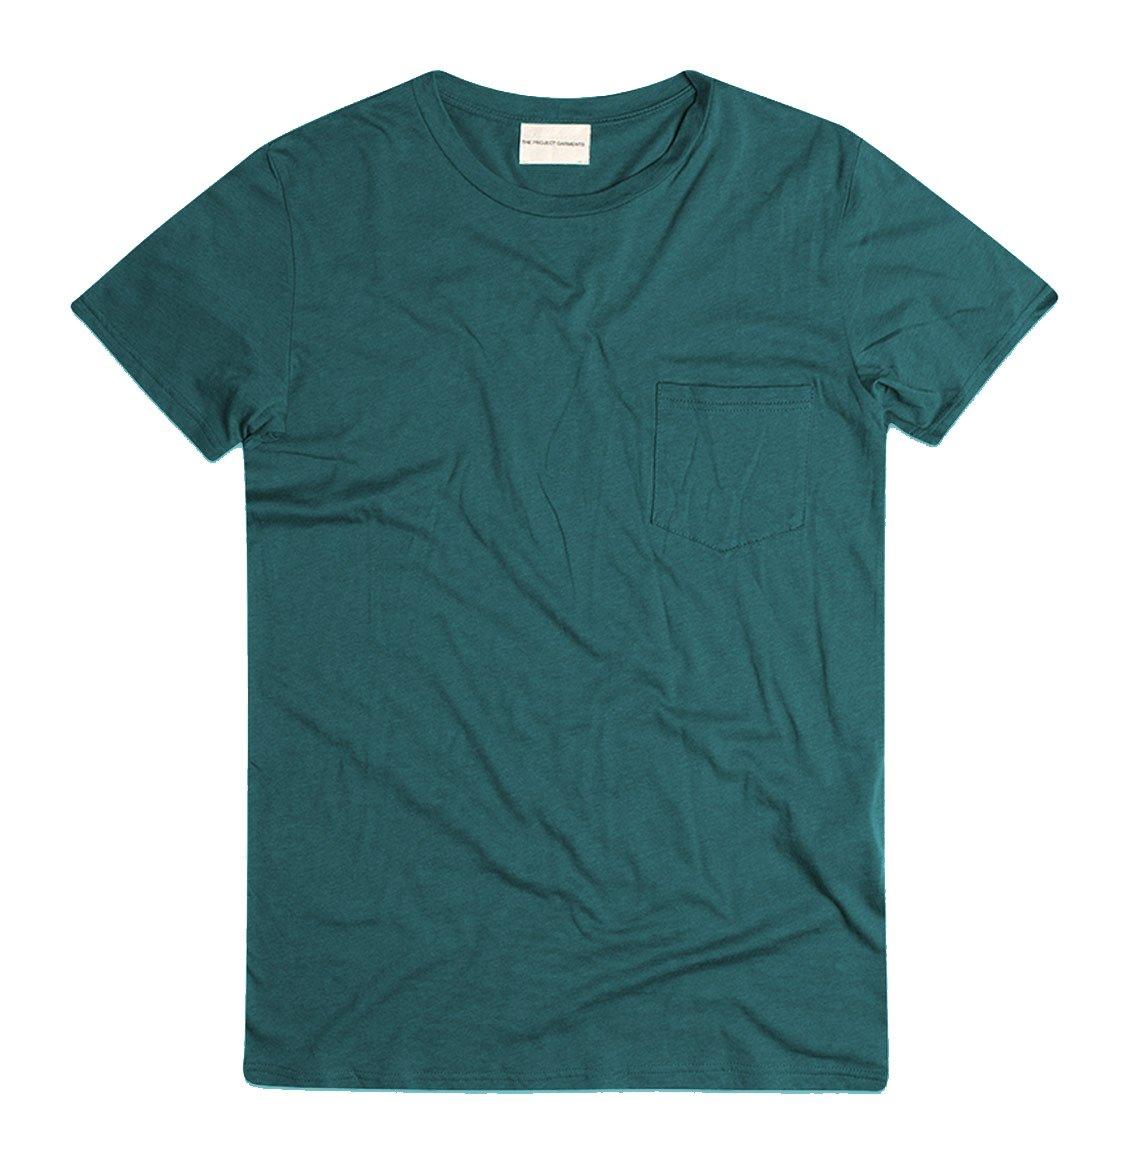 The Project Garments Crew Neck Modal-Blend Pocket T-shirt Myrtle Green